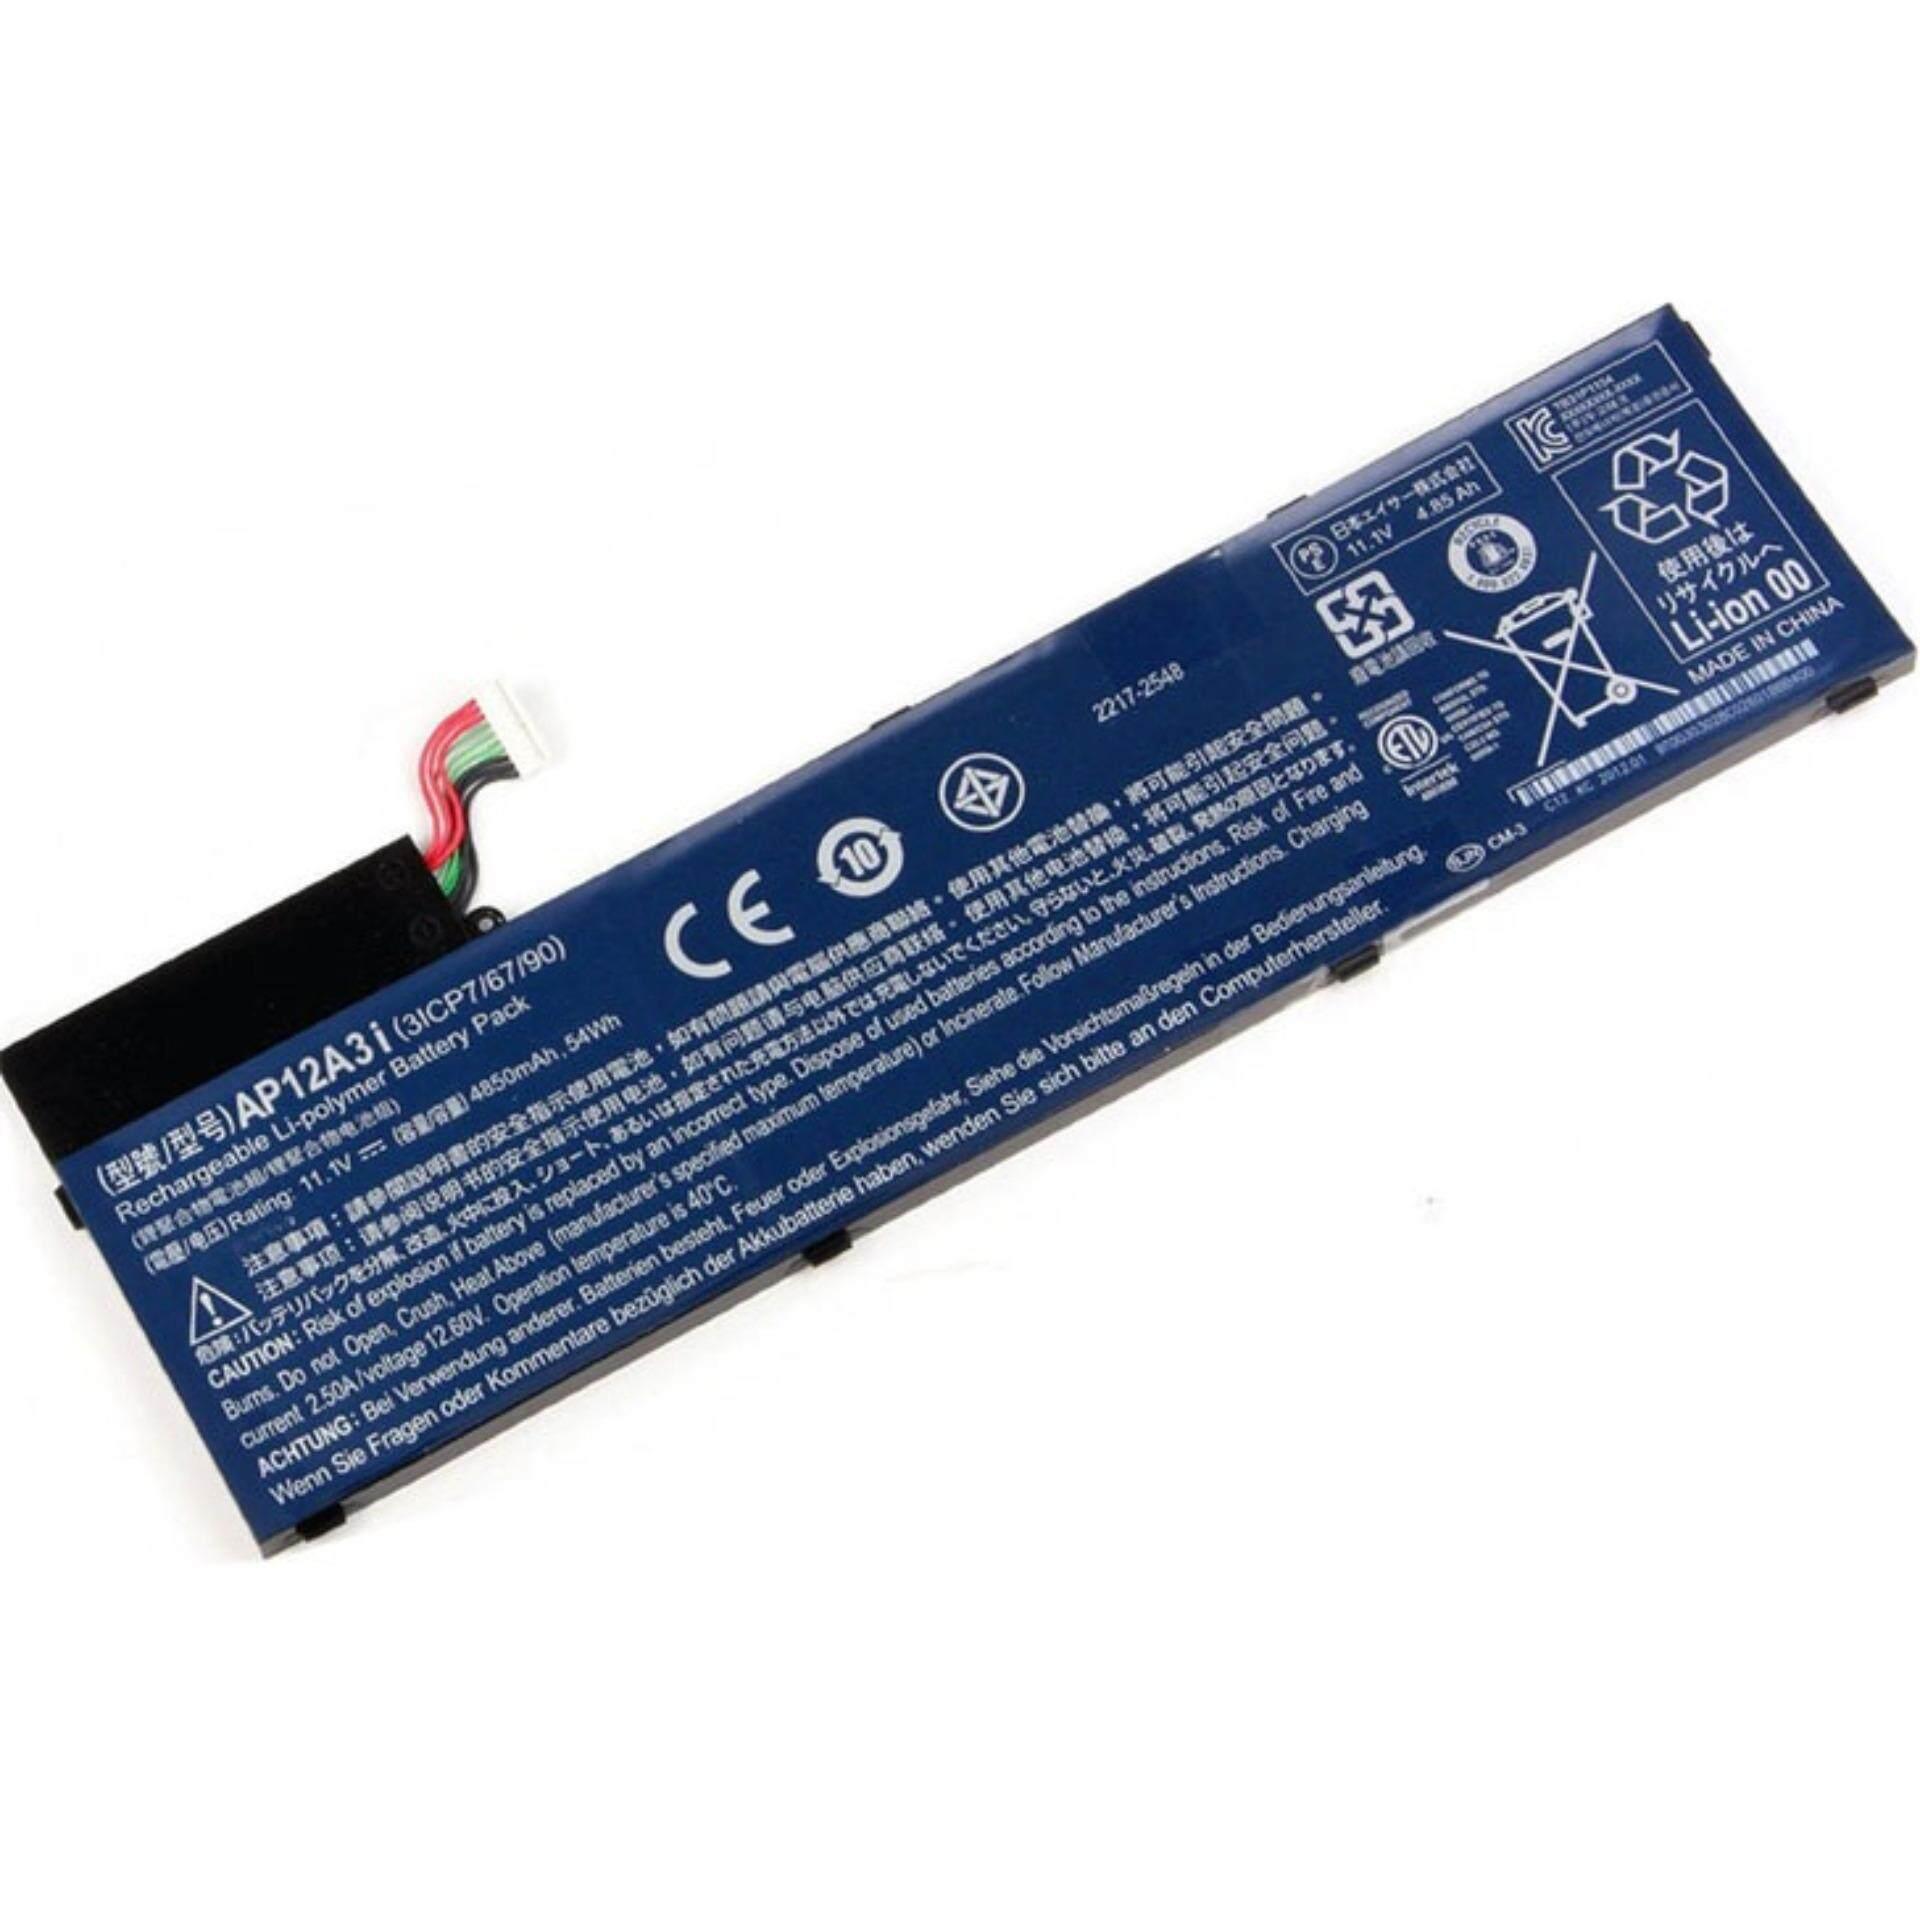 Acer Aspire M5-481TG-53316G12MASS TIMELINE ULTRA Laptop Battery